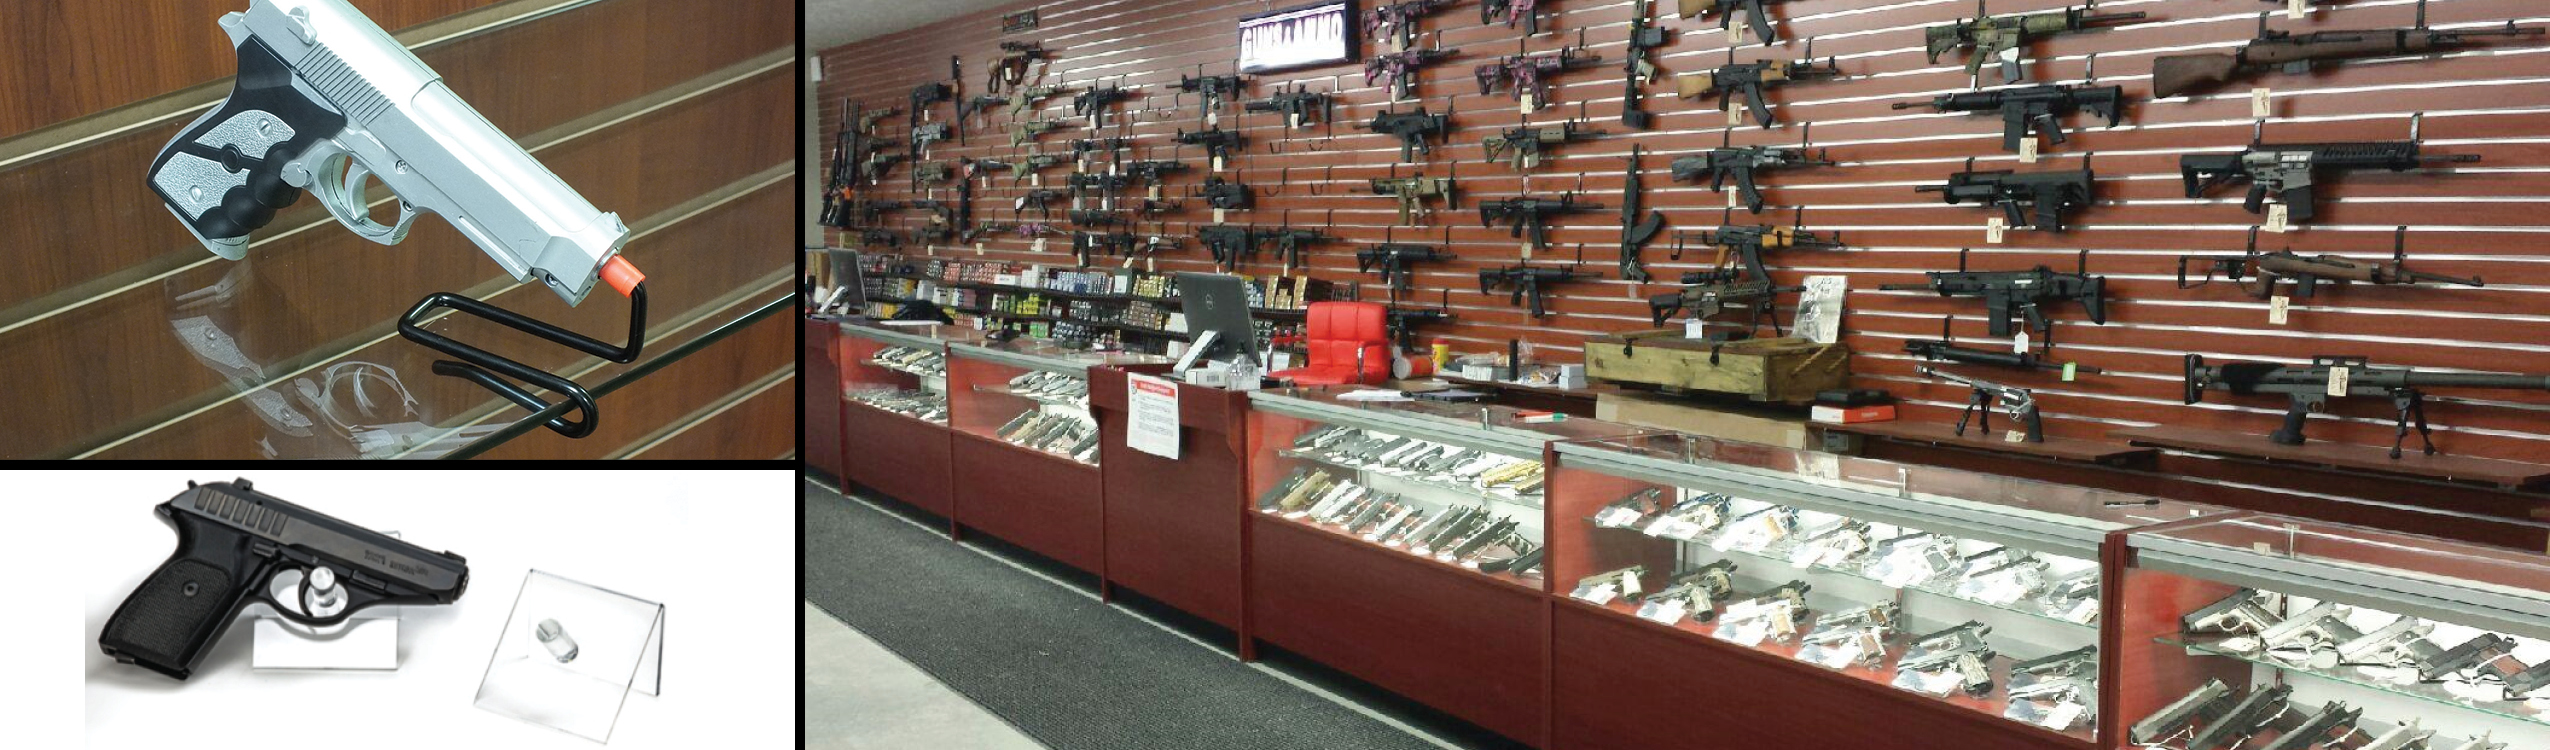 Firearm Displays